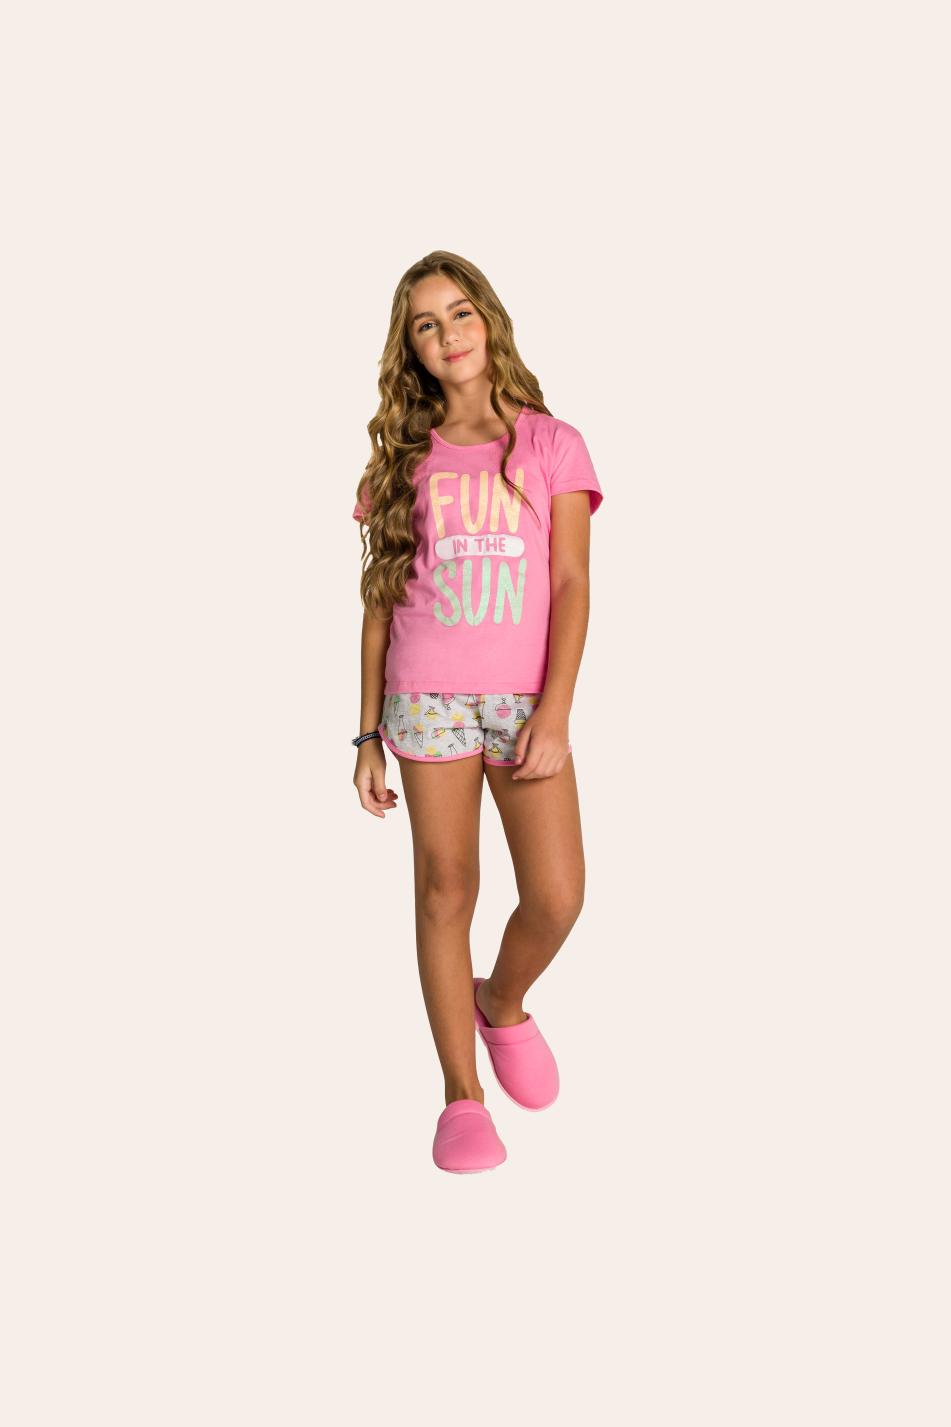 205/B - Pijama Juvenil Feminino Curto Estampa Glitter - Mãe e Filha